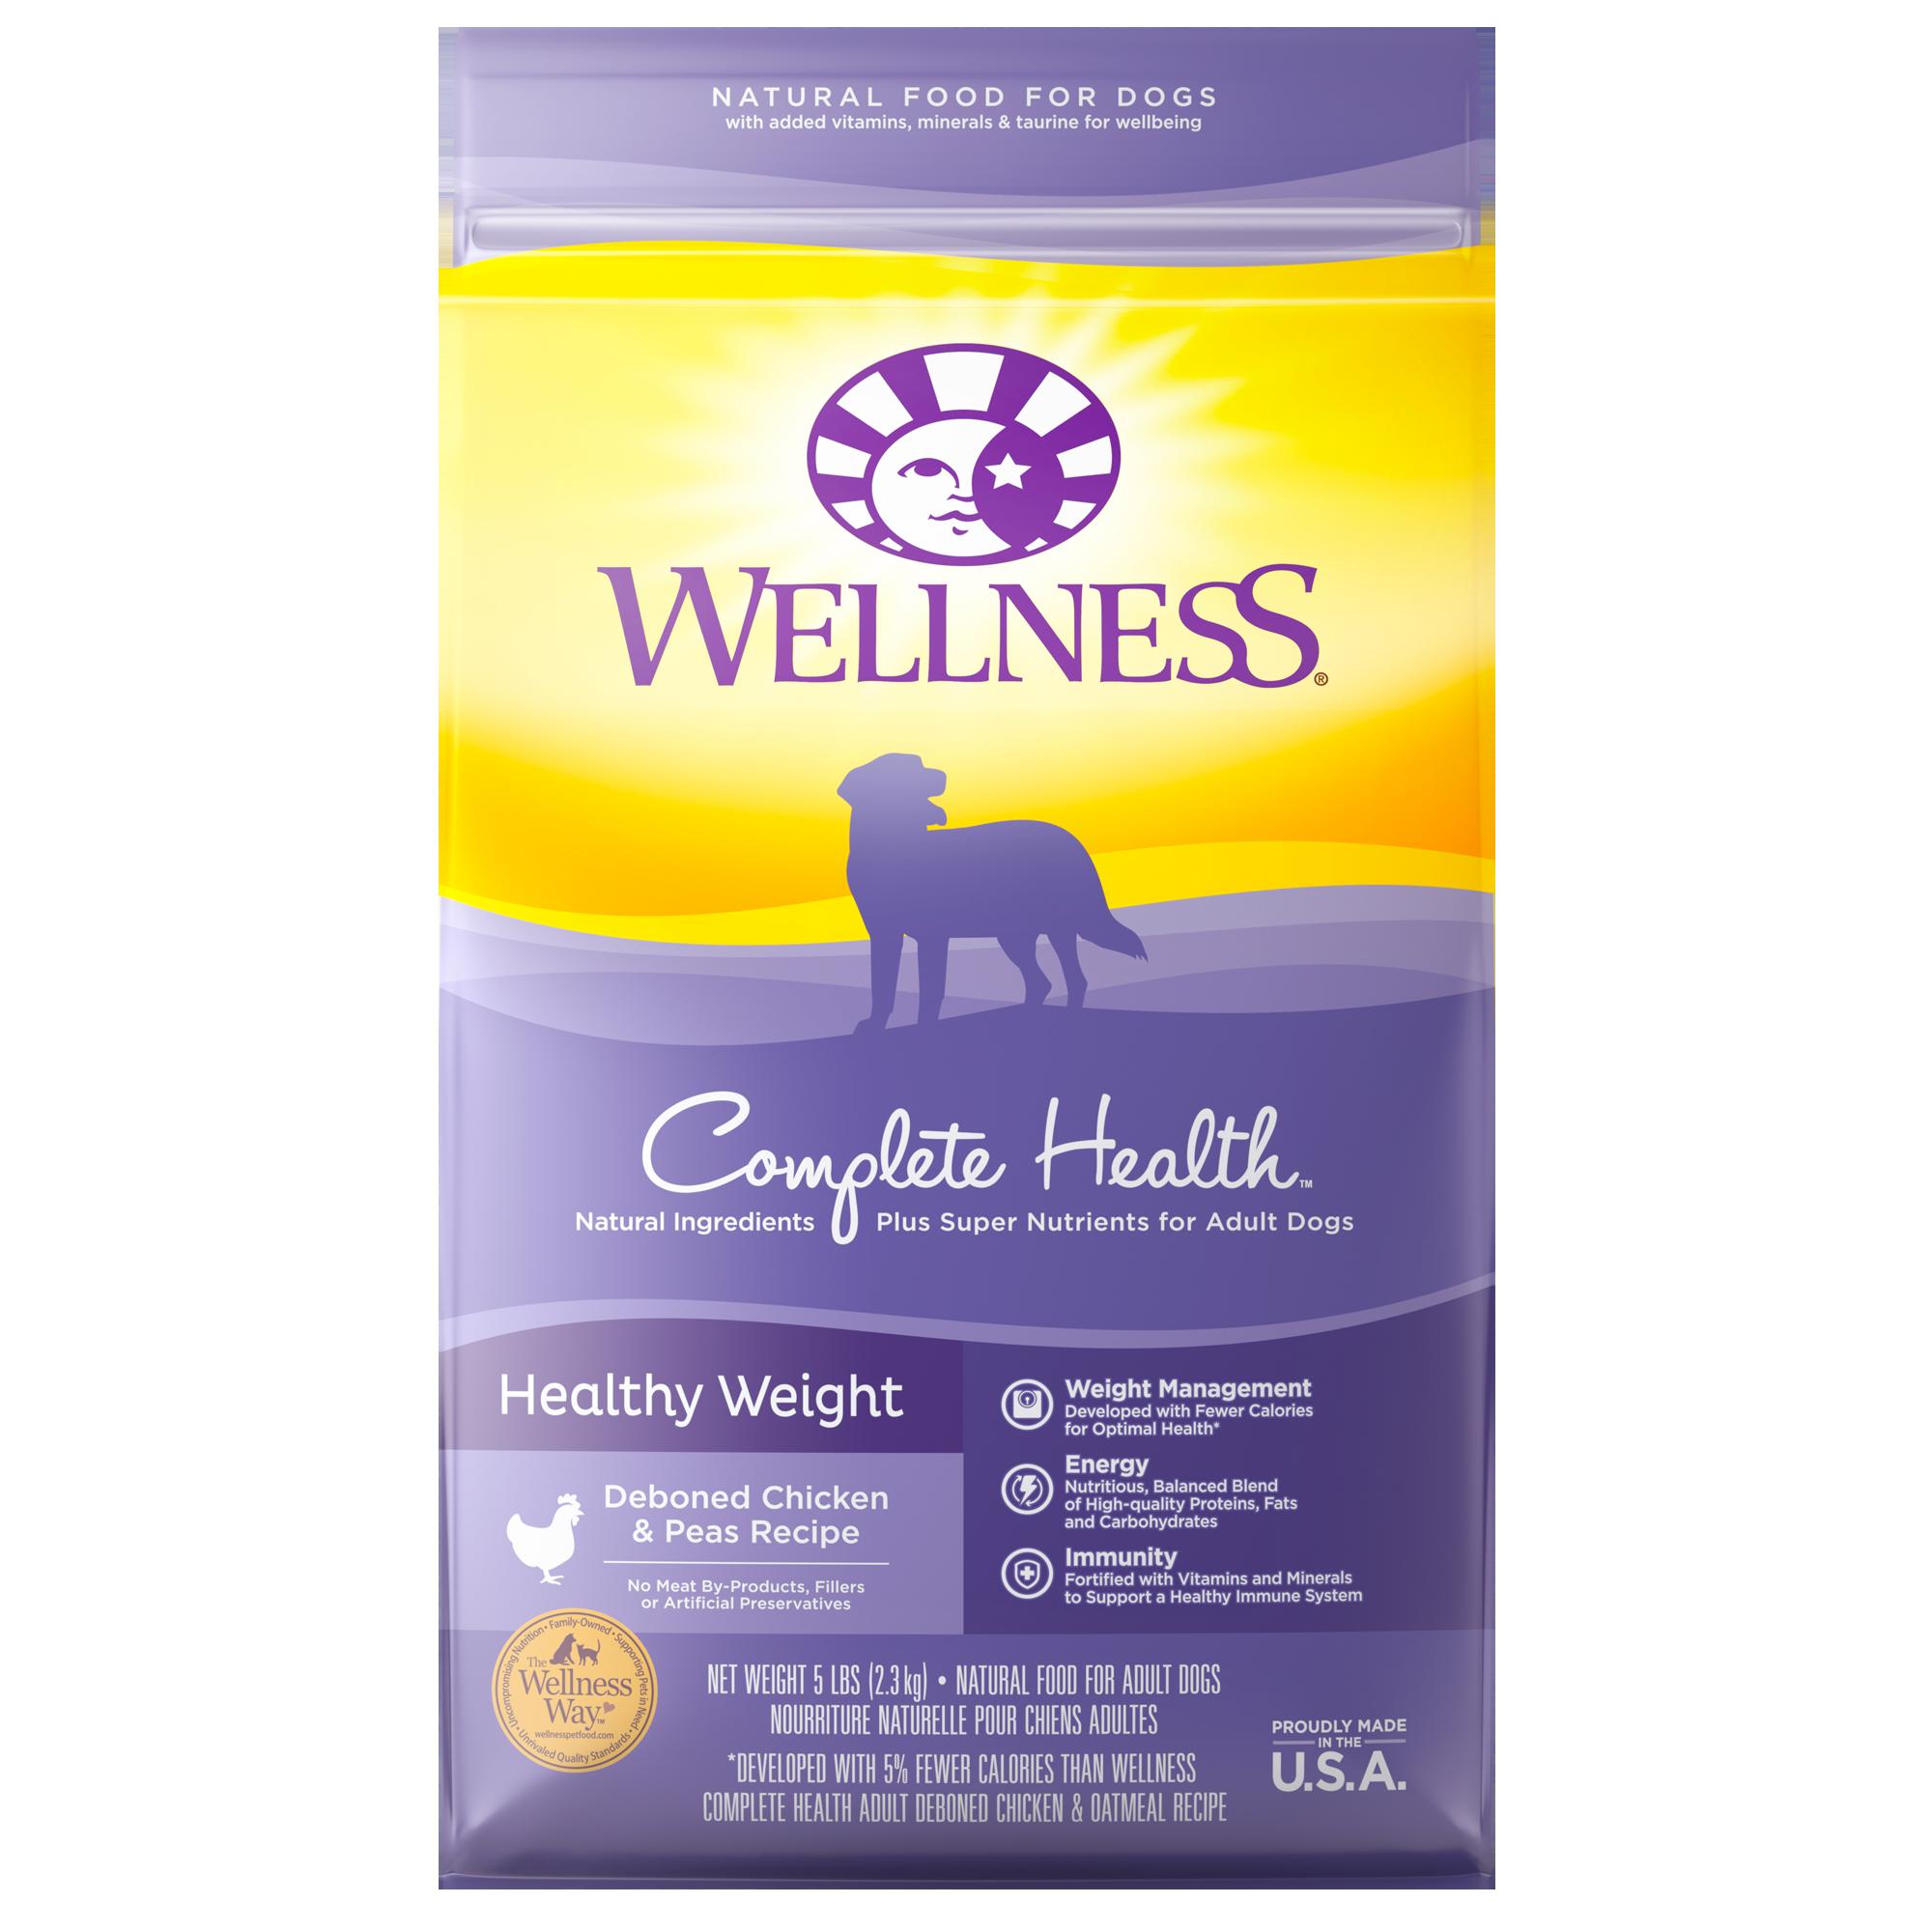 Wellness Complete Health Healthy Weight Deboned Chicken & Peas Recipe Dry Dog Food, 26-lb